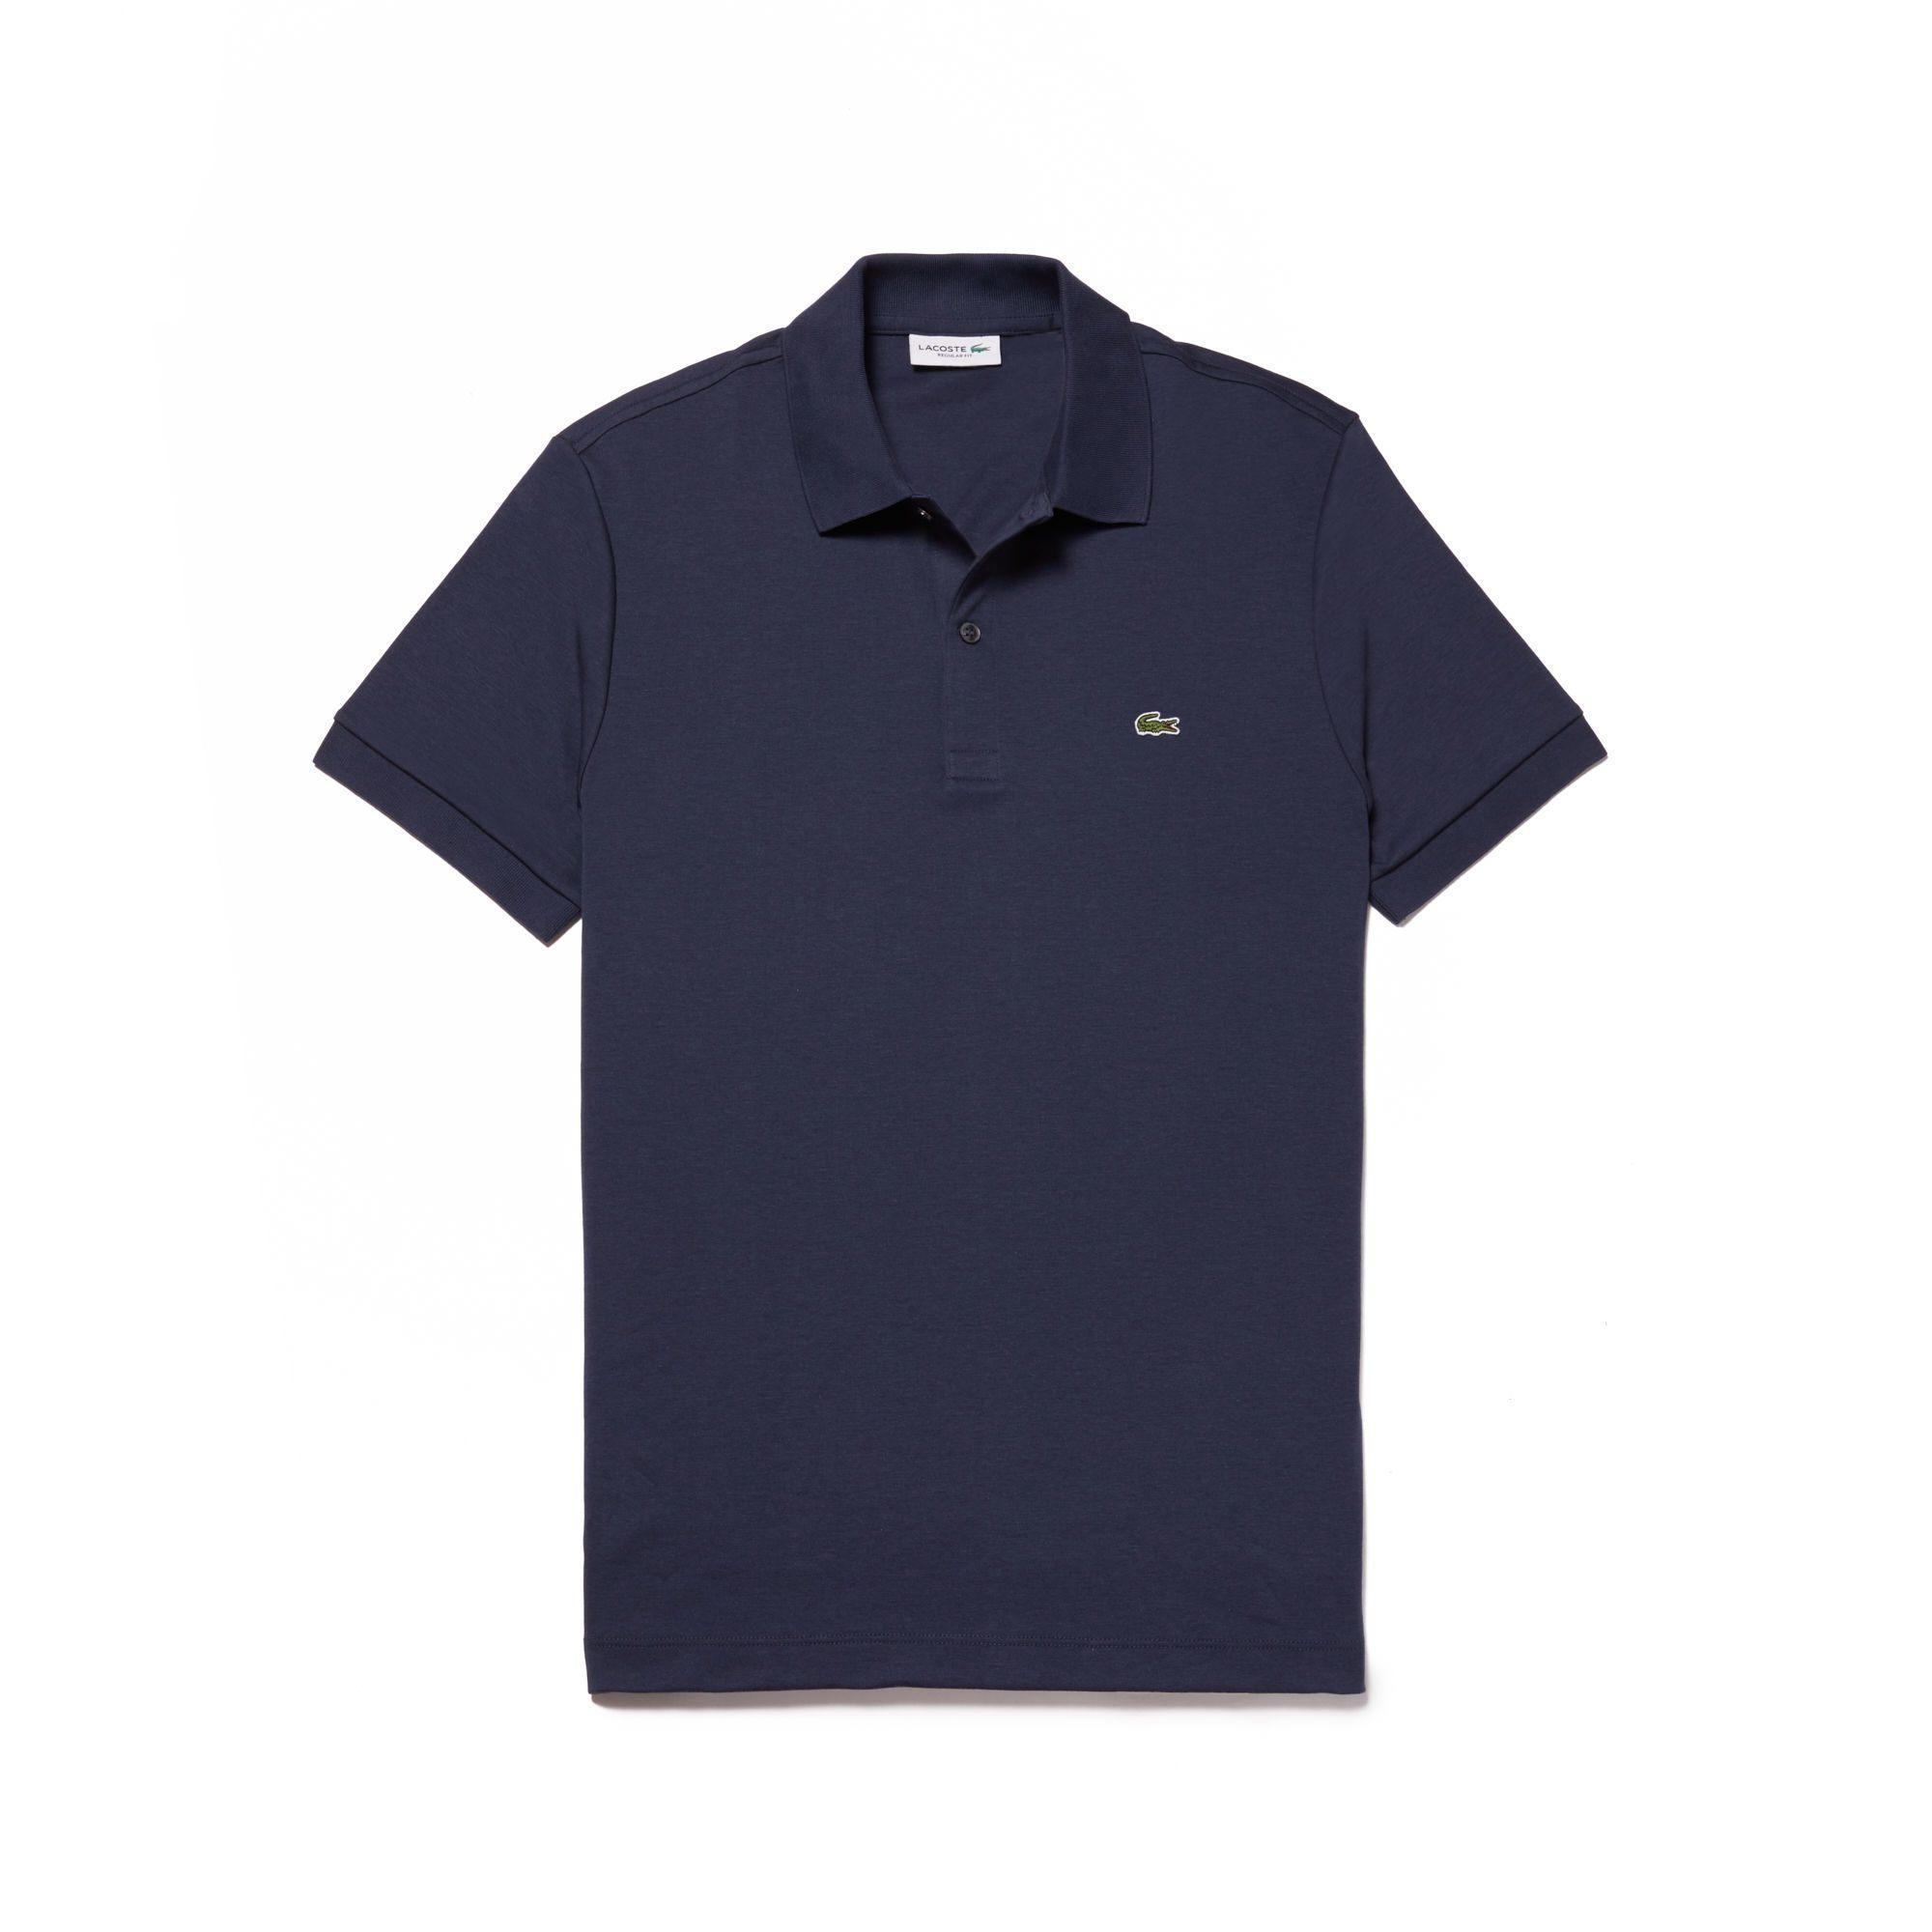 Lacoste Men's Regular Fit Pima Cotton Interlock Polo In Blue